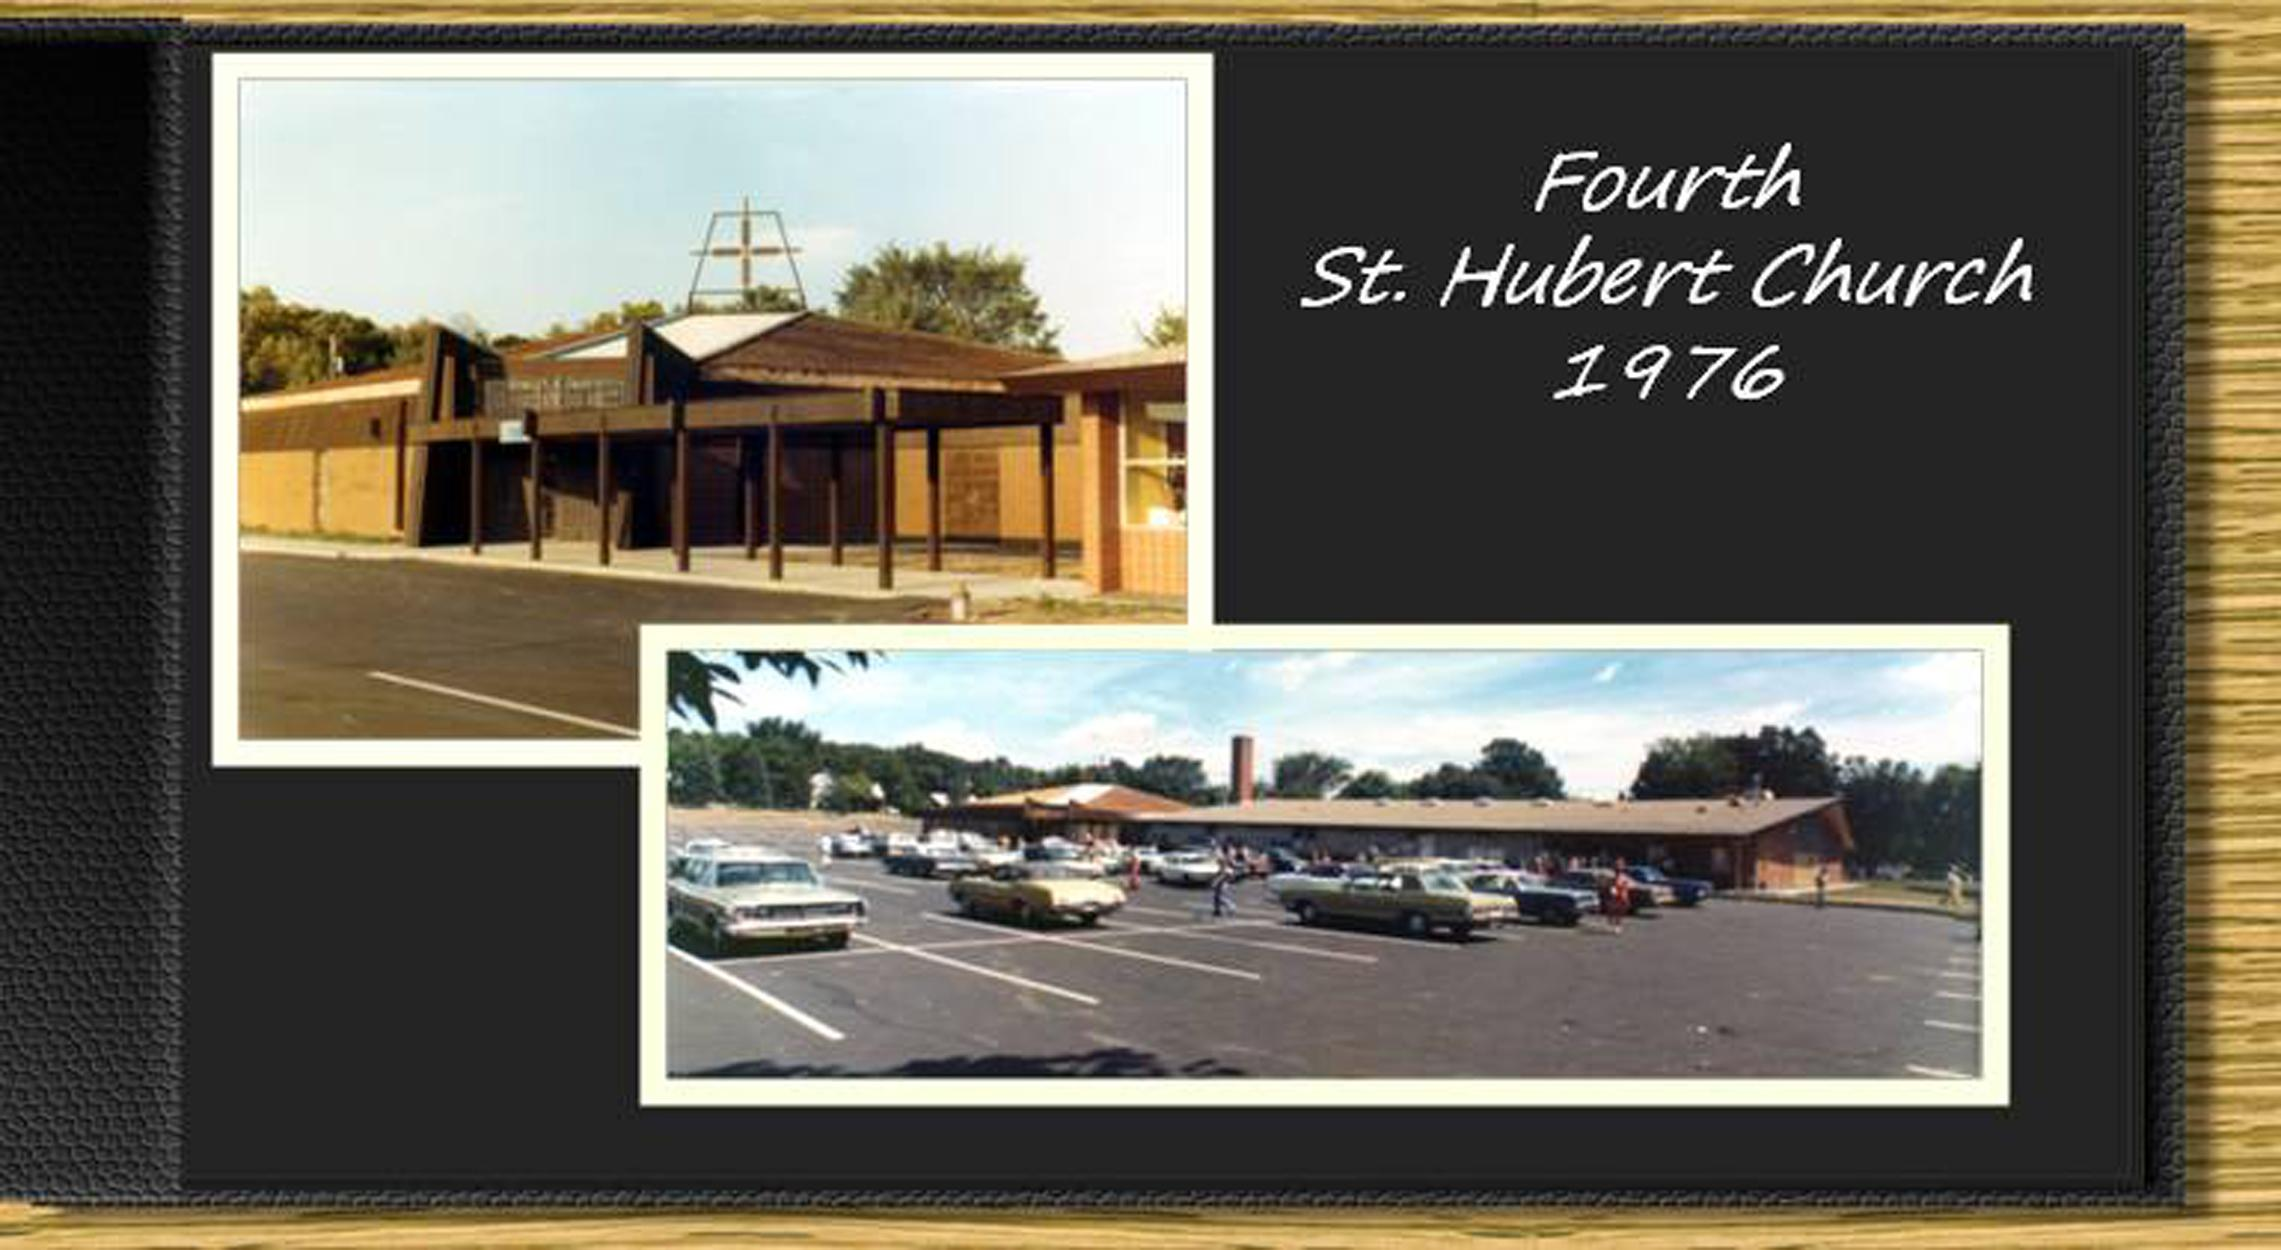 fourth st hubert church.jpg